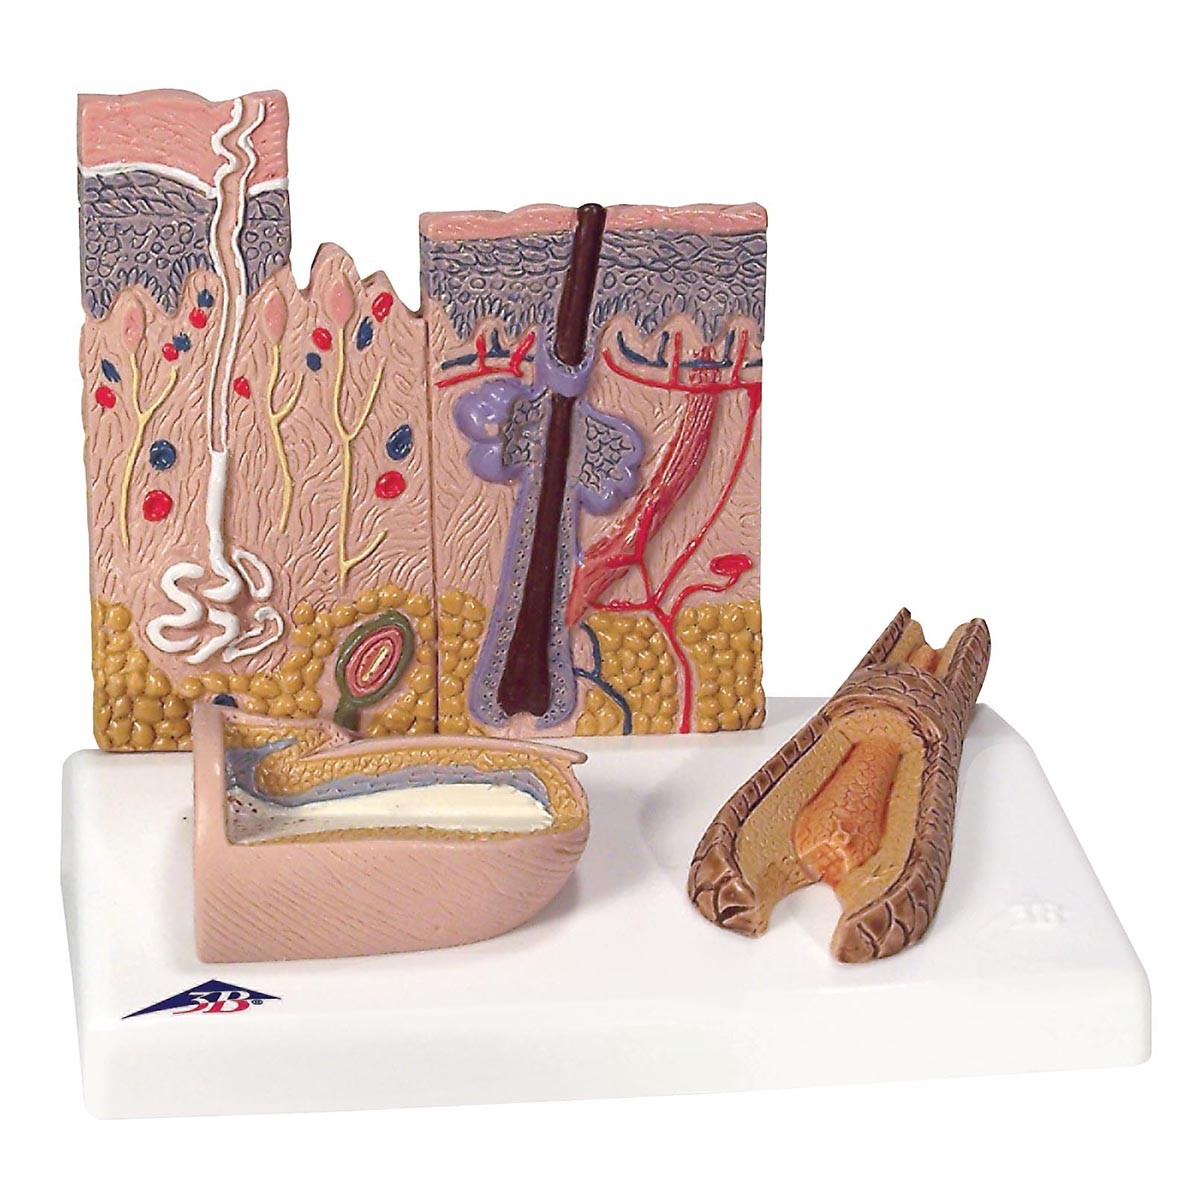 3B Skin, Hair & Nail Model - Skin Models - Human Anatomy - Biology